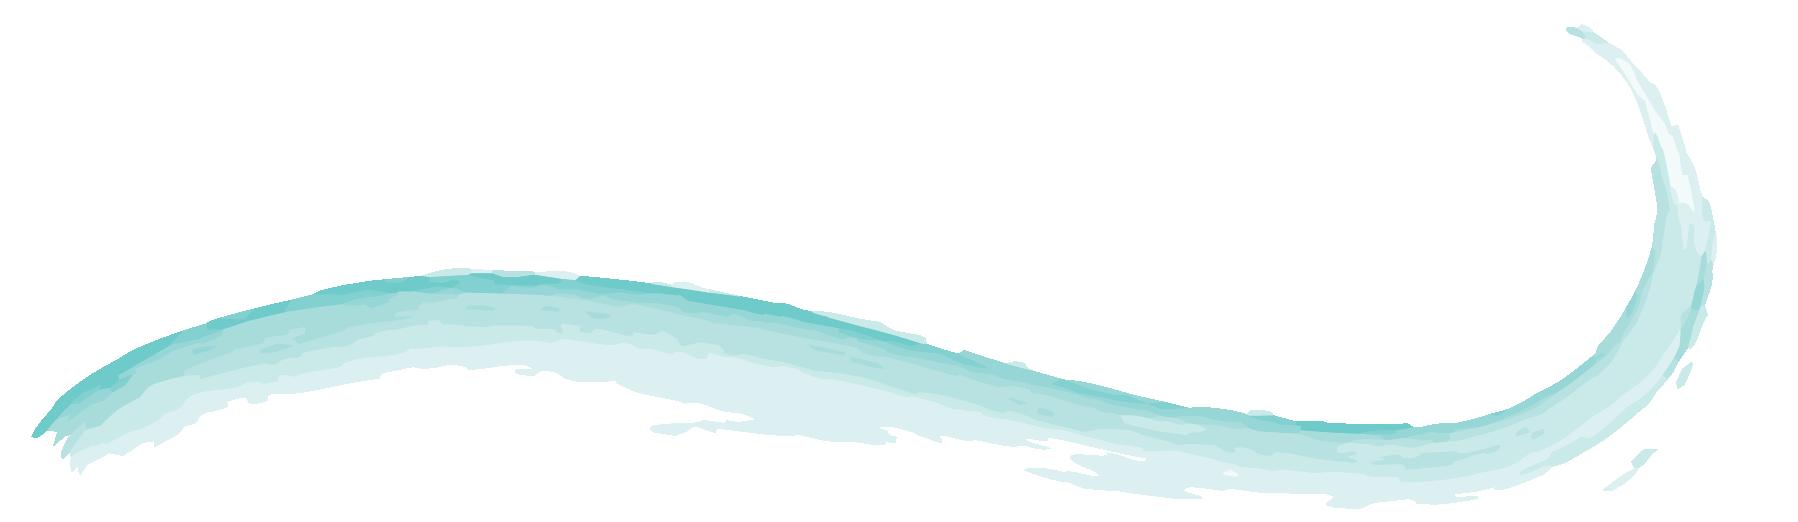 CG Wave